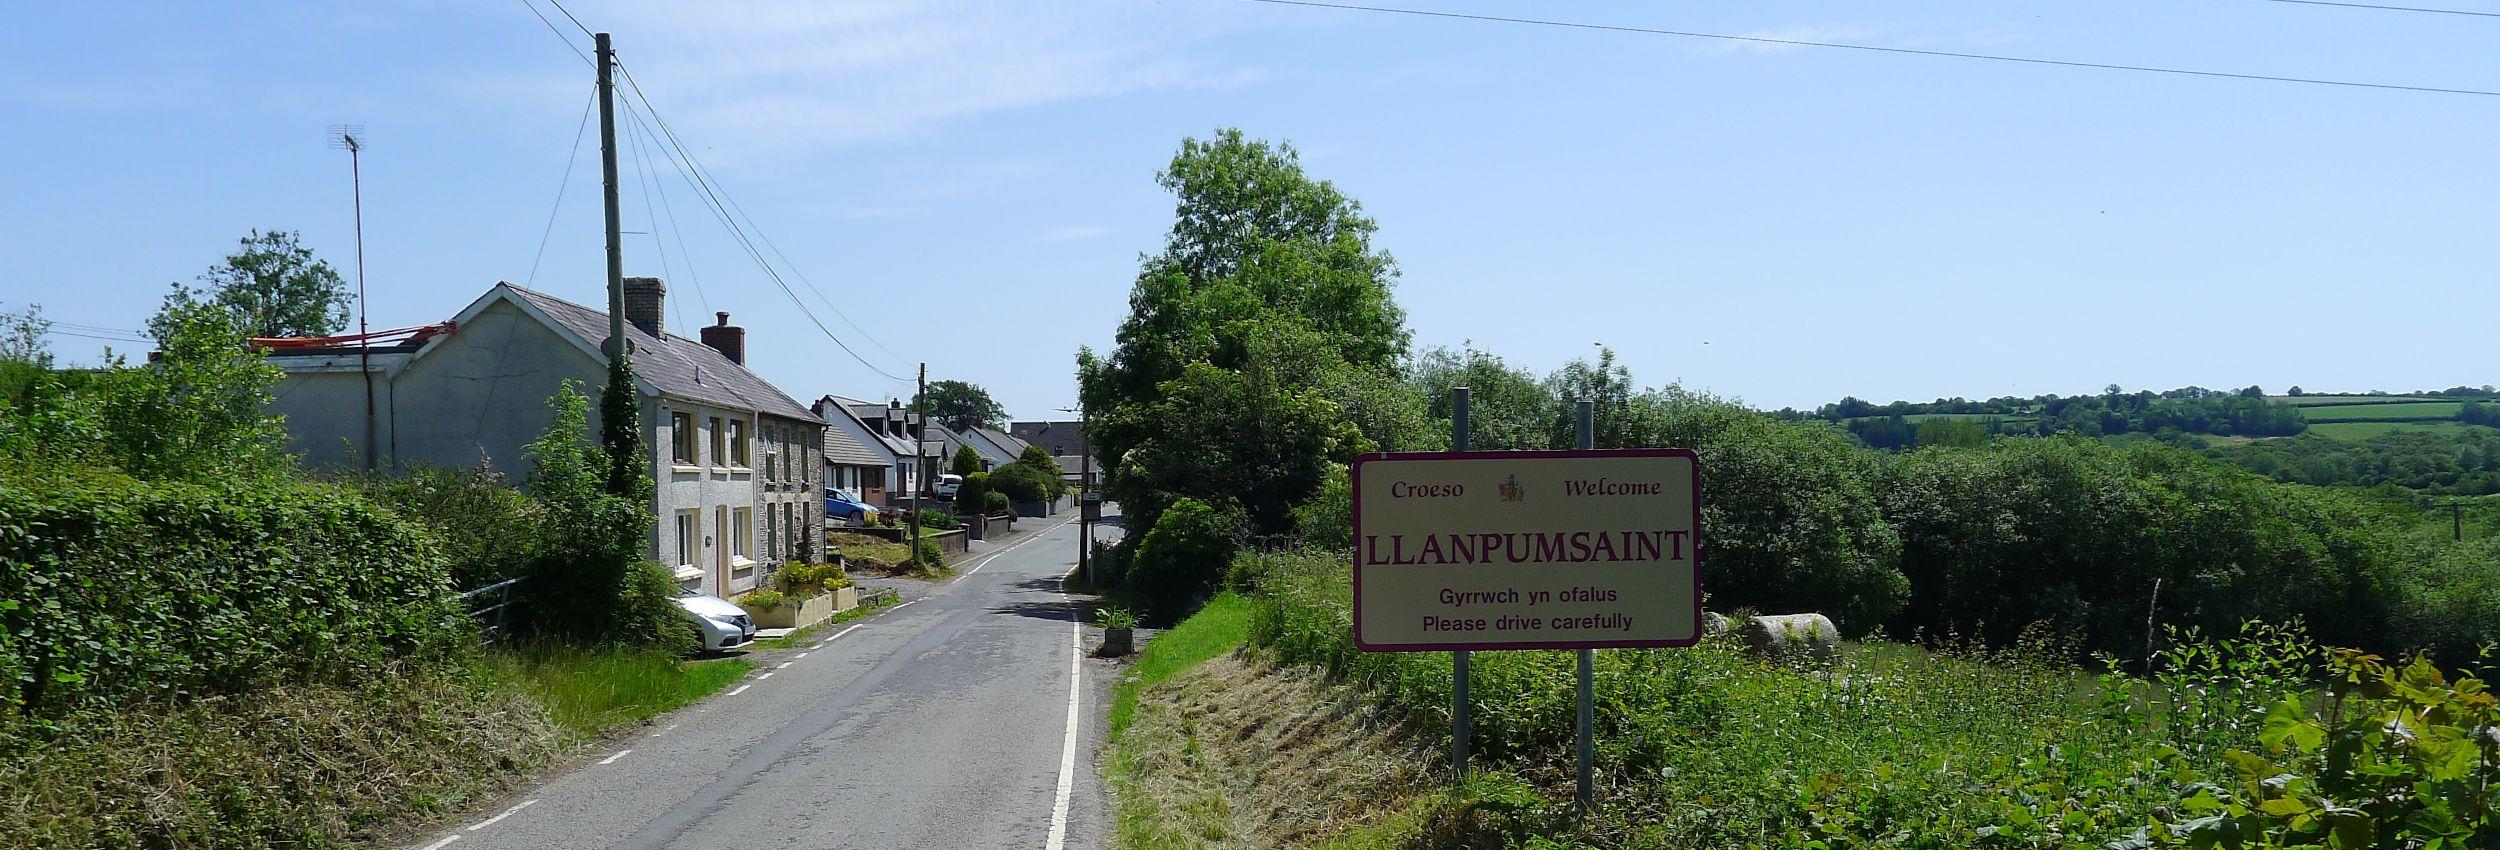 Llanpumsaint-Banners-2019-10